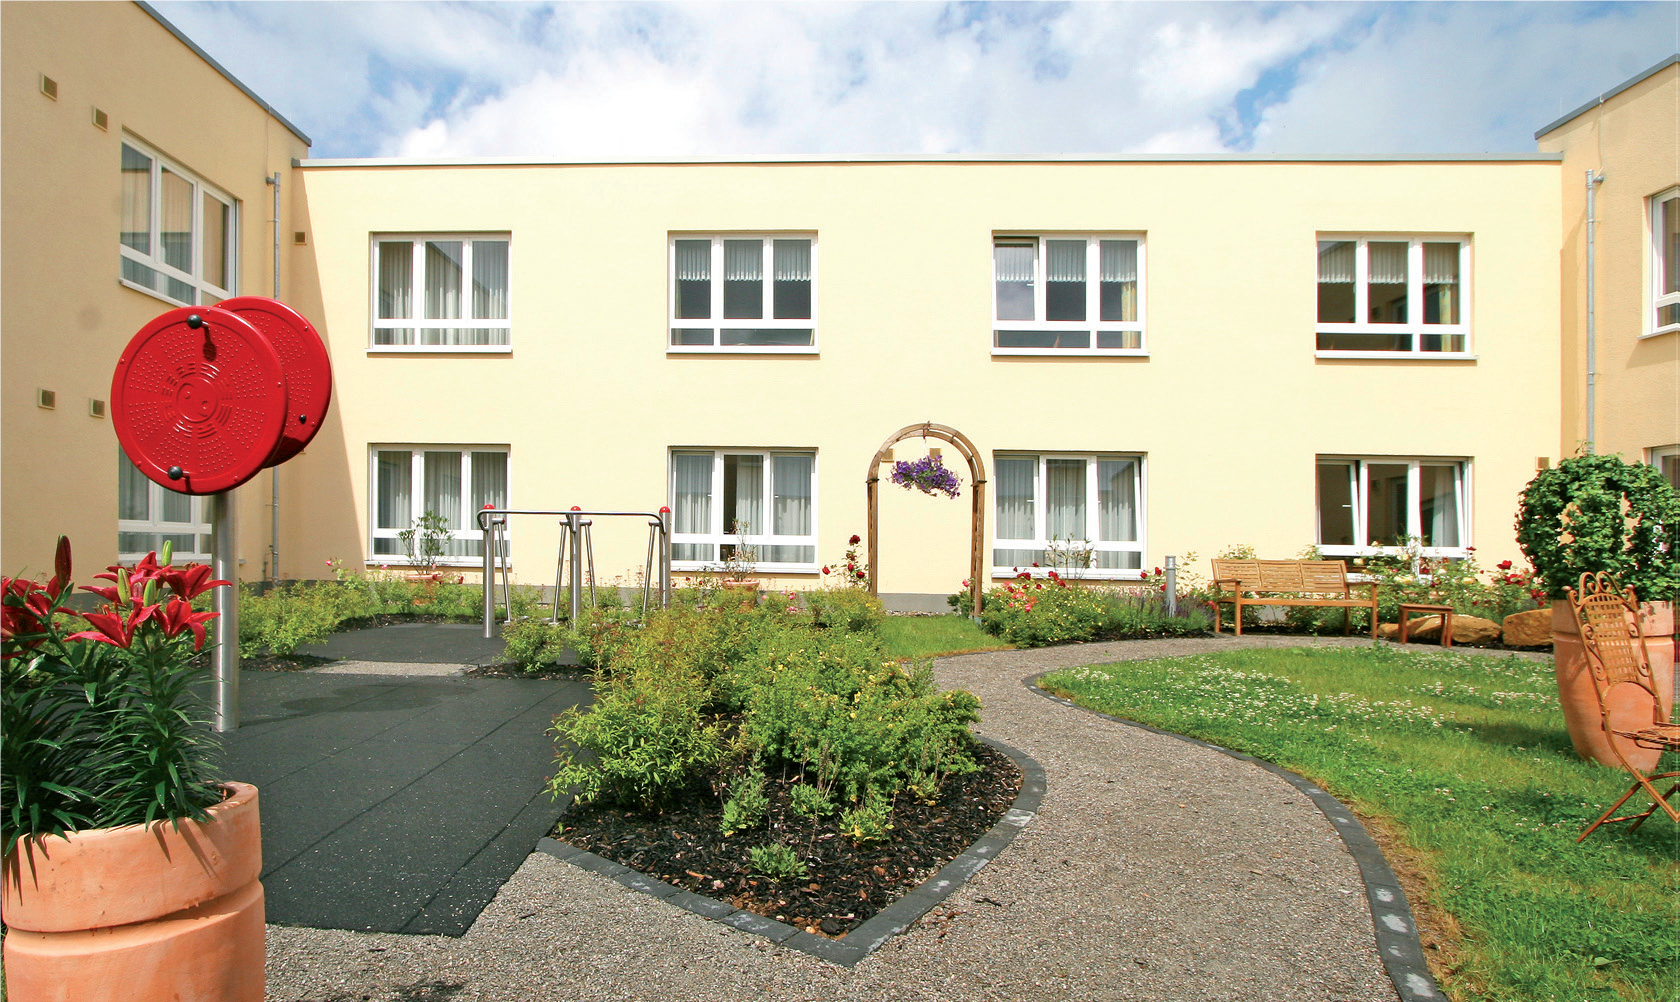 Seniorenheim Haus Phönix am Teichberg